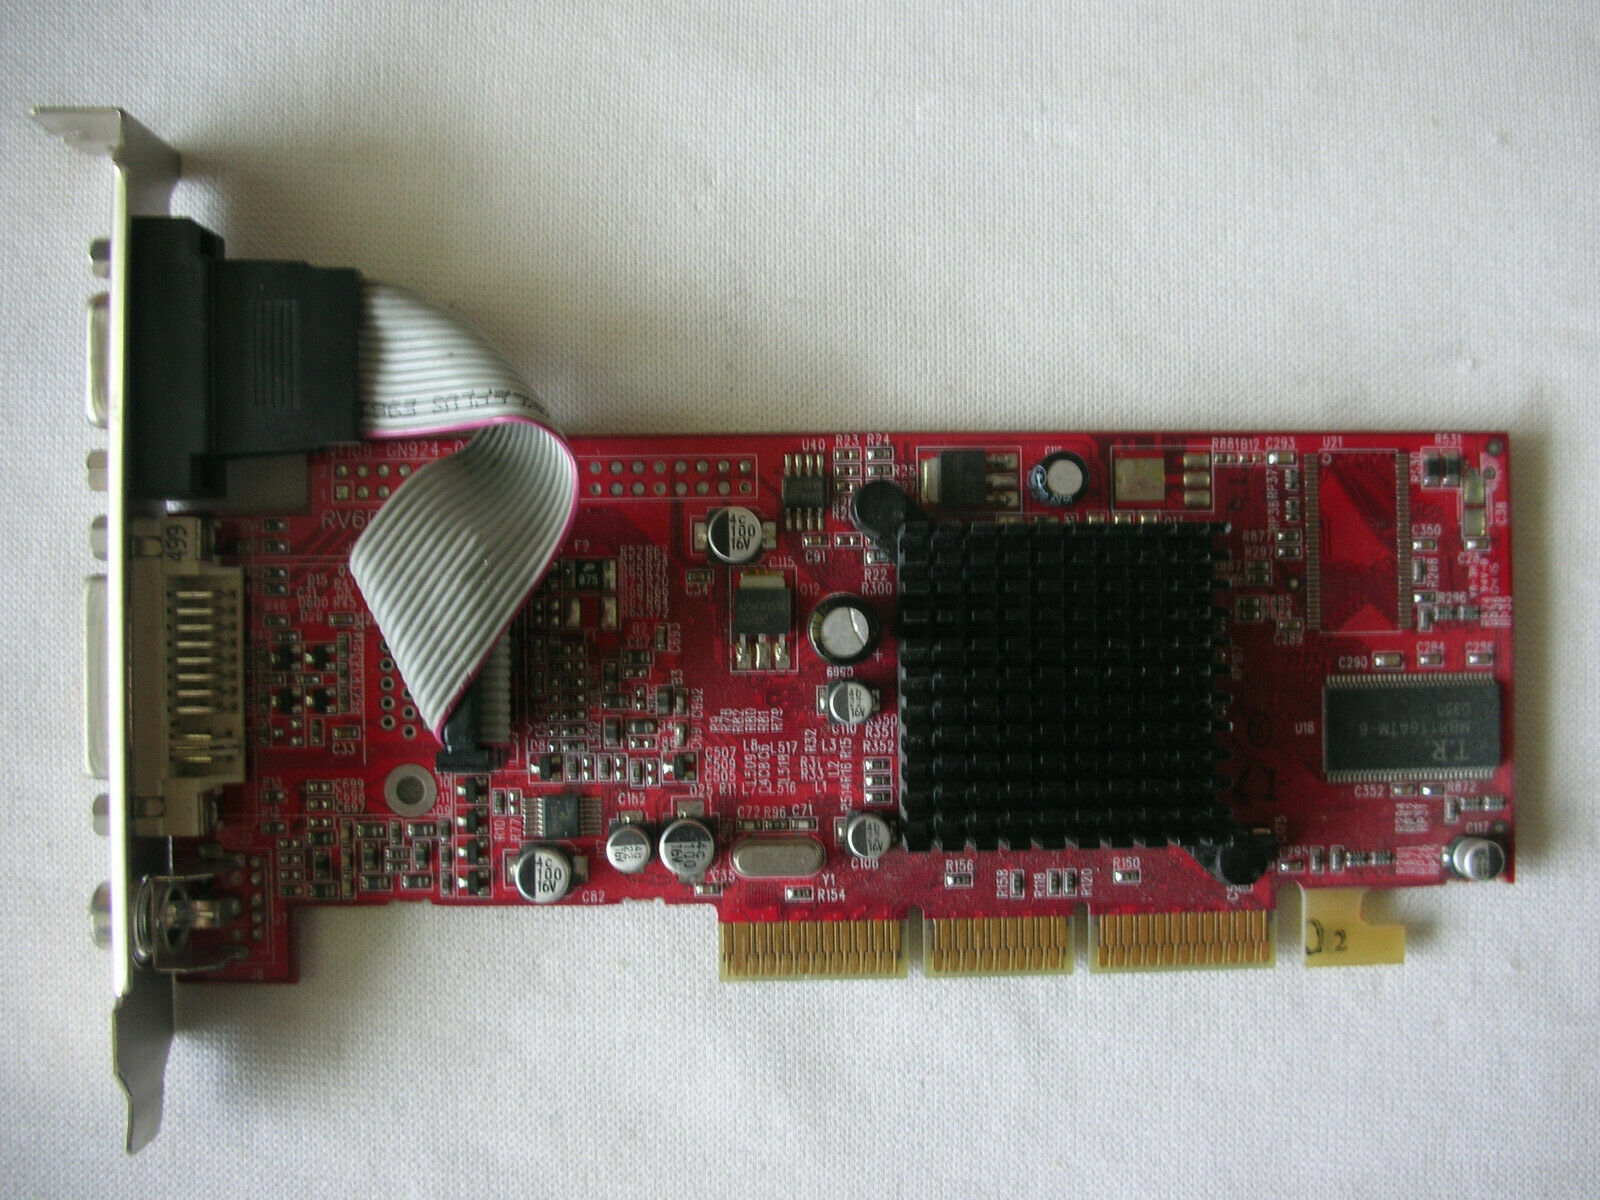 Powercolor RV6DE ATI Radeon 7000 64mb VGA TV Out DVI AGP